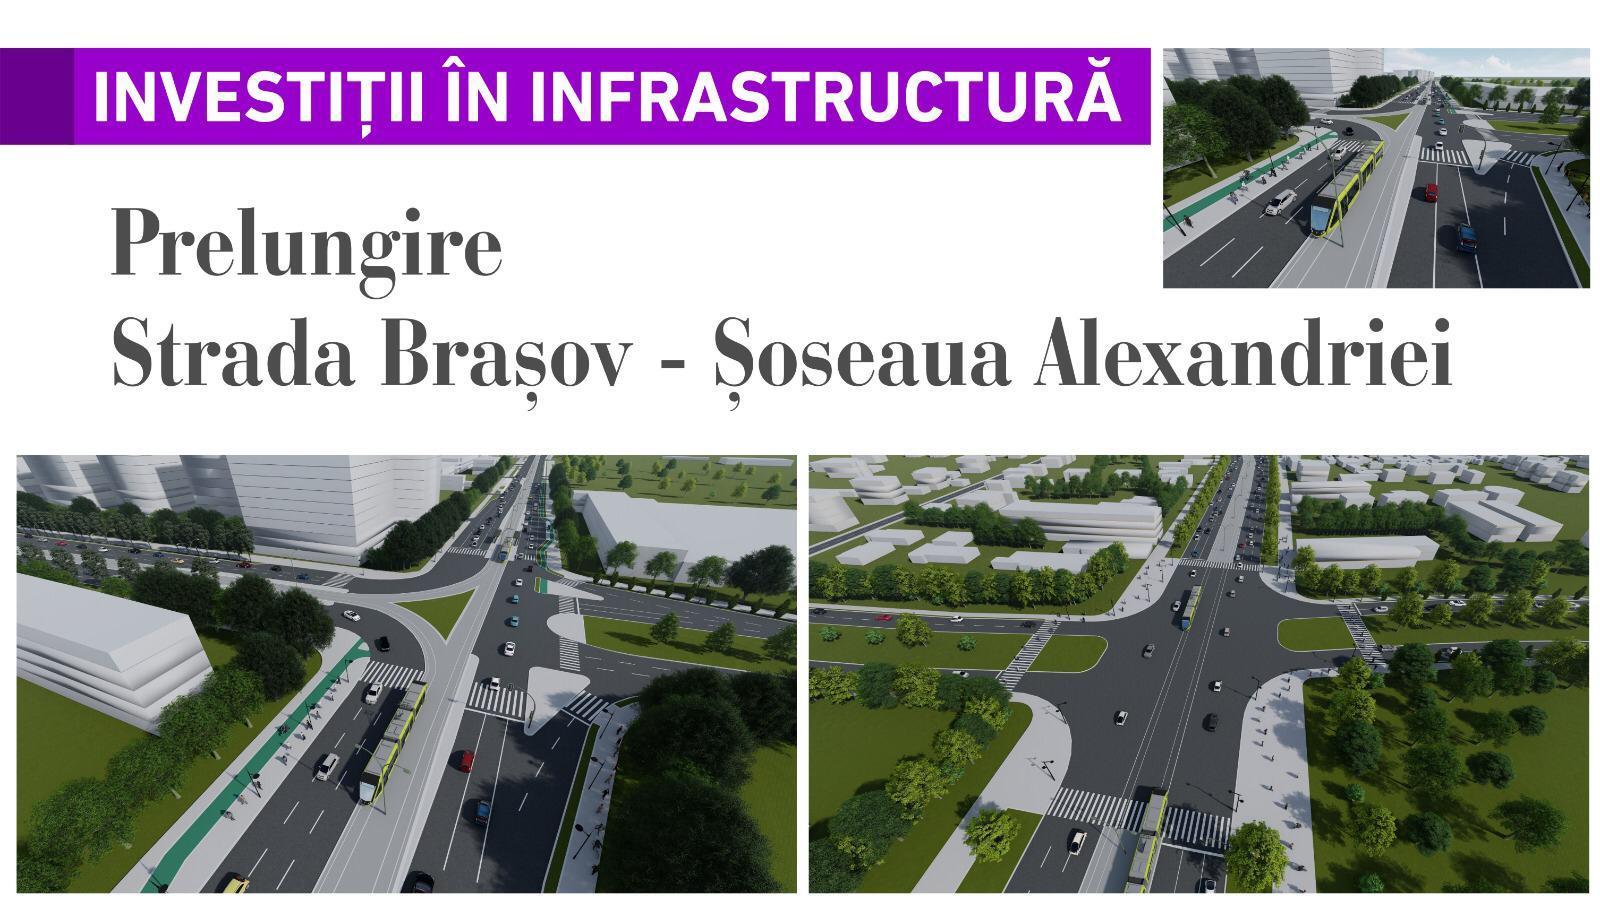 Prelungire Strada Brașov - Șoseaua Alexandriei